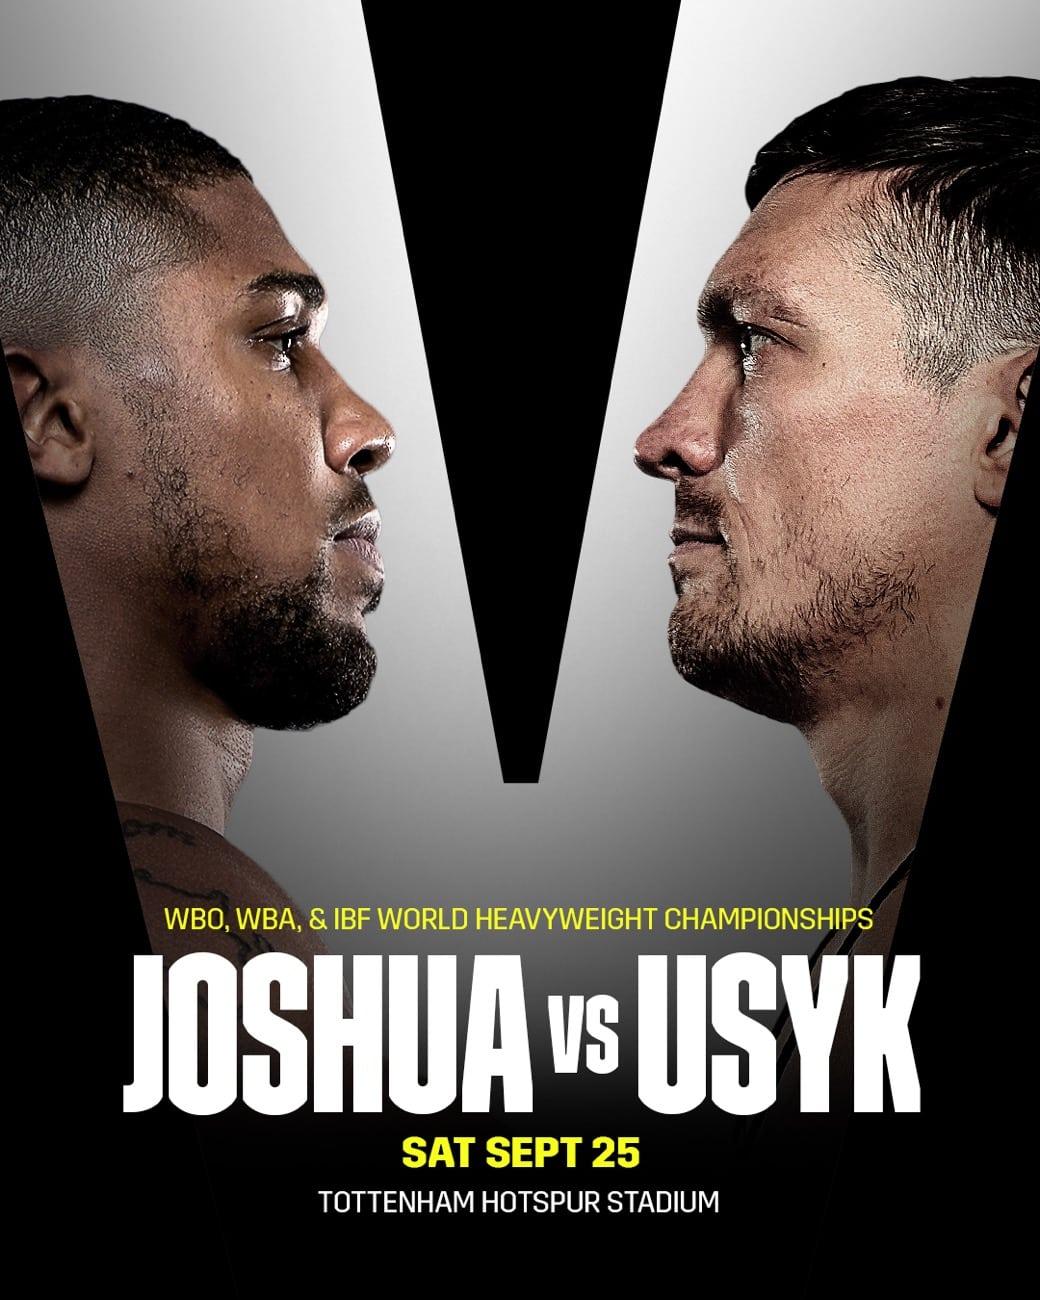 Joshua vs Usyk - Sky Sports, DAZN - Sept 25 - 2 pm ET